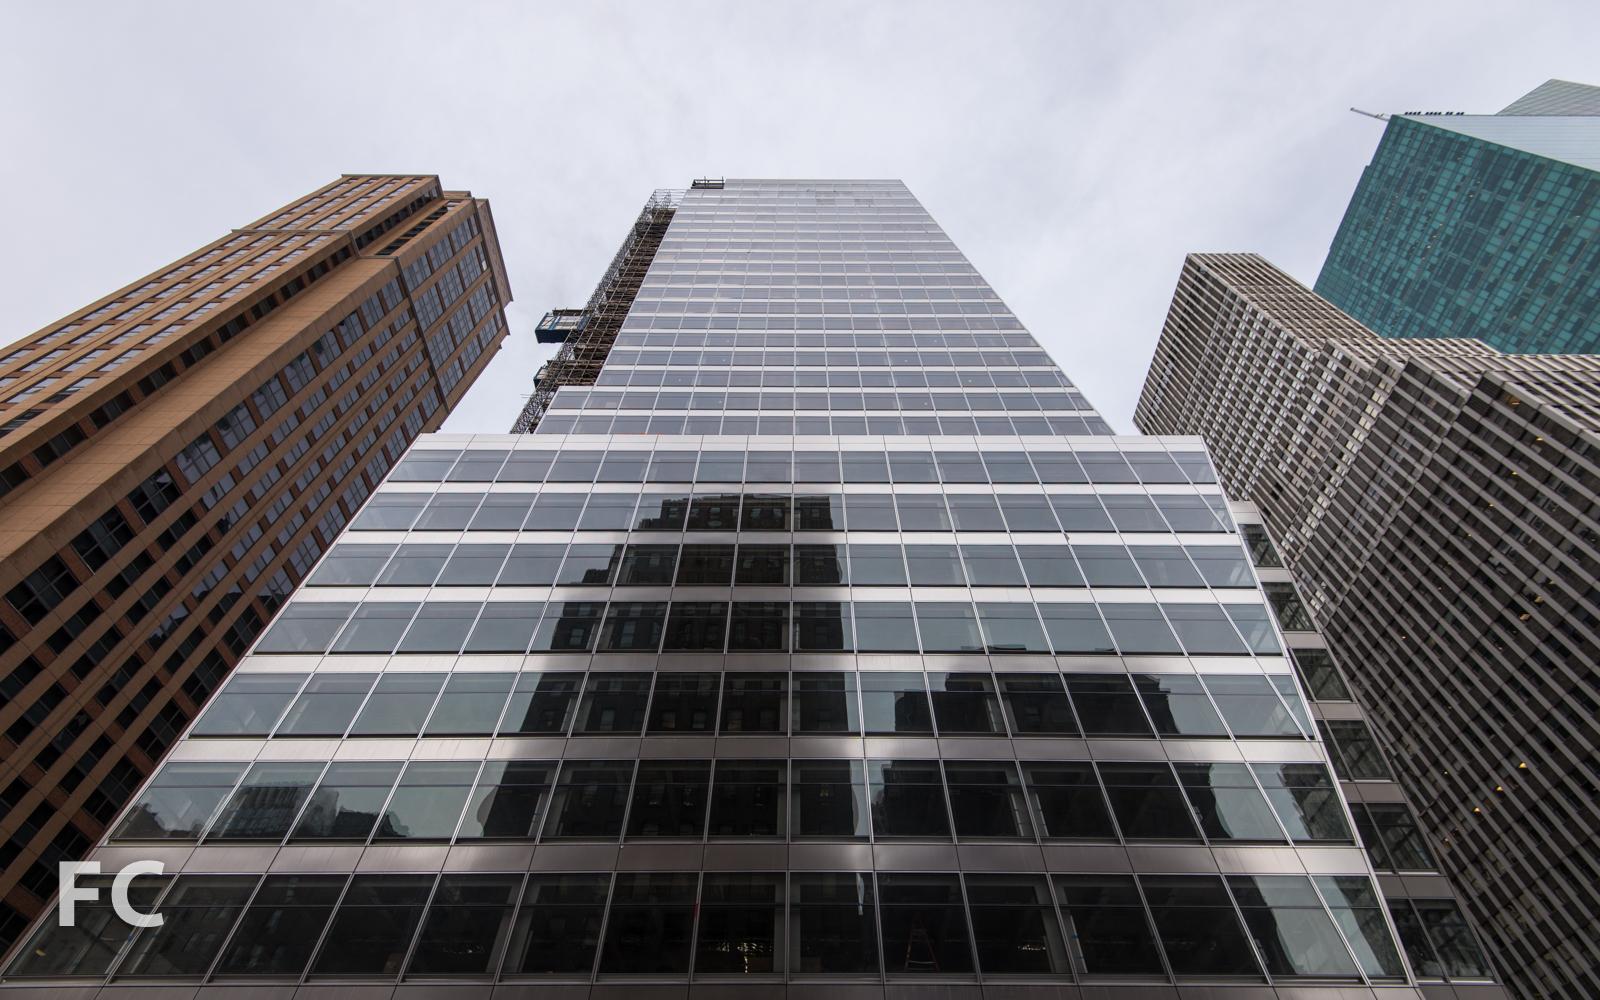 East façade from Sixth Avenue.